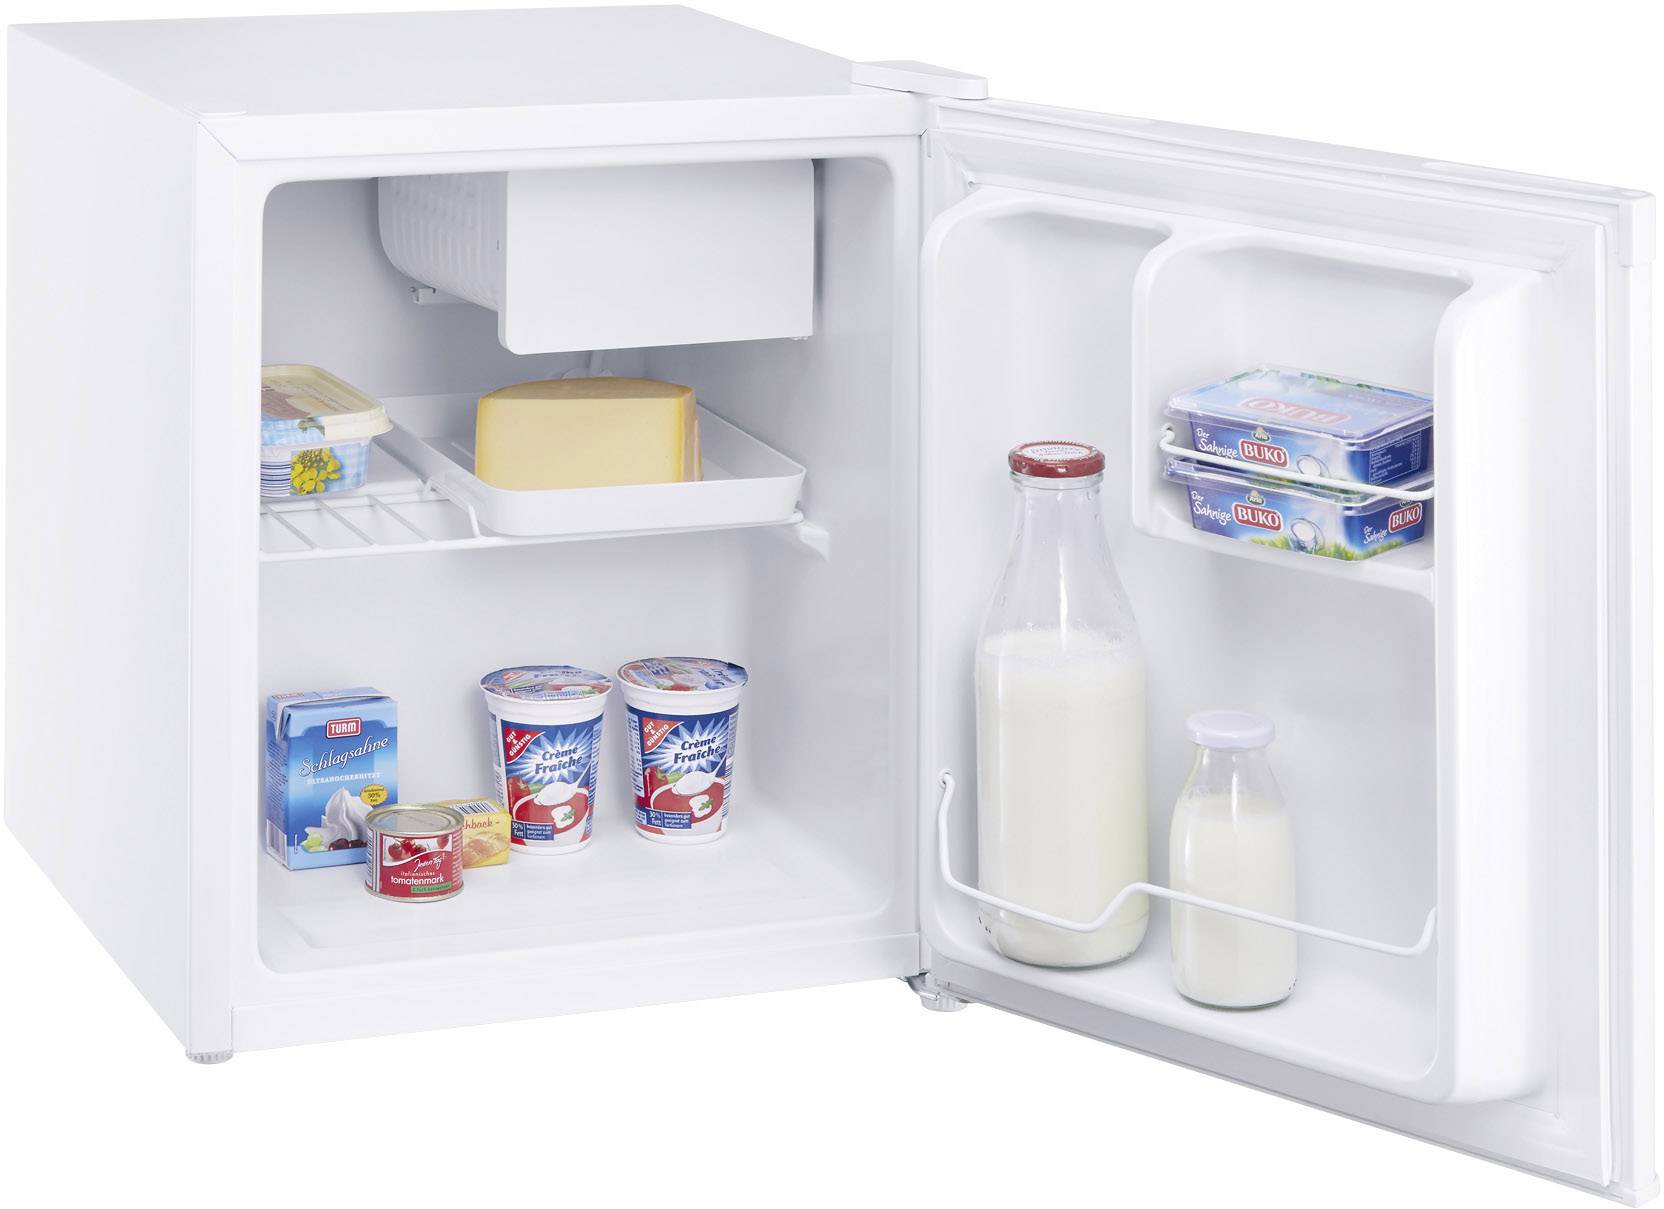 Mini Kühlschrank Bomann Kb 167 : Severin ks kühlschrank l energieeffizienzklasse a d